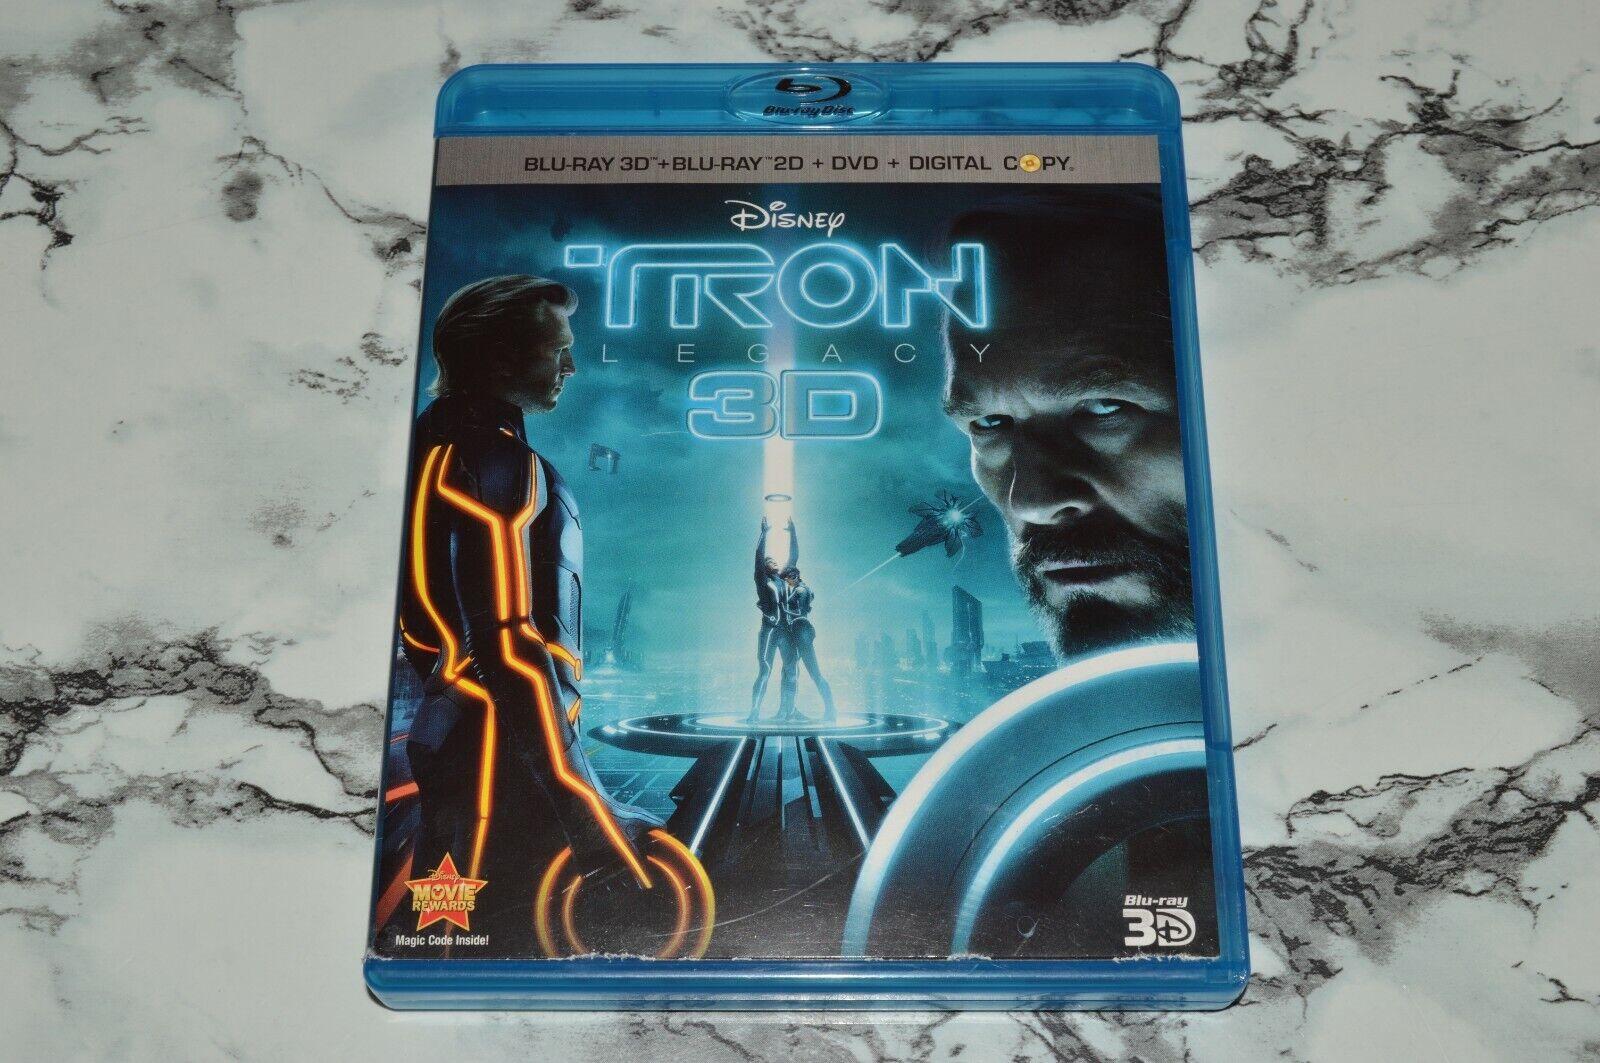 Disney - Tron Legacy 3D Blu-Ray 3D Blu-Ray 2D DVD Digital Copy Disc  - $12.68